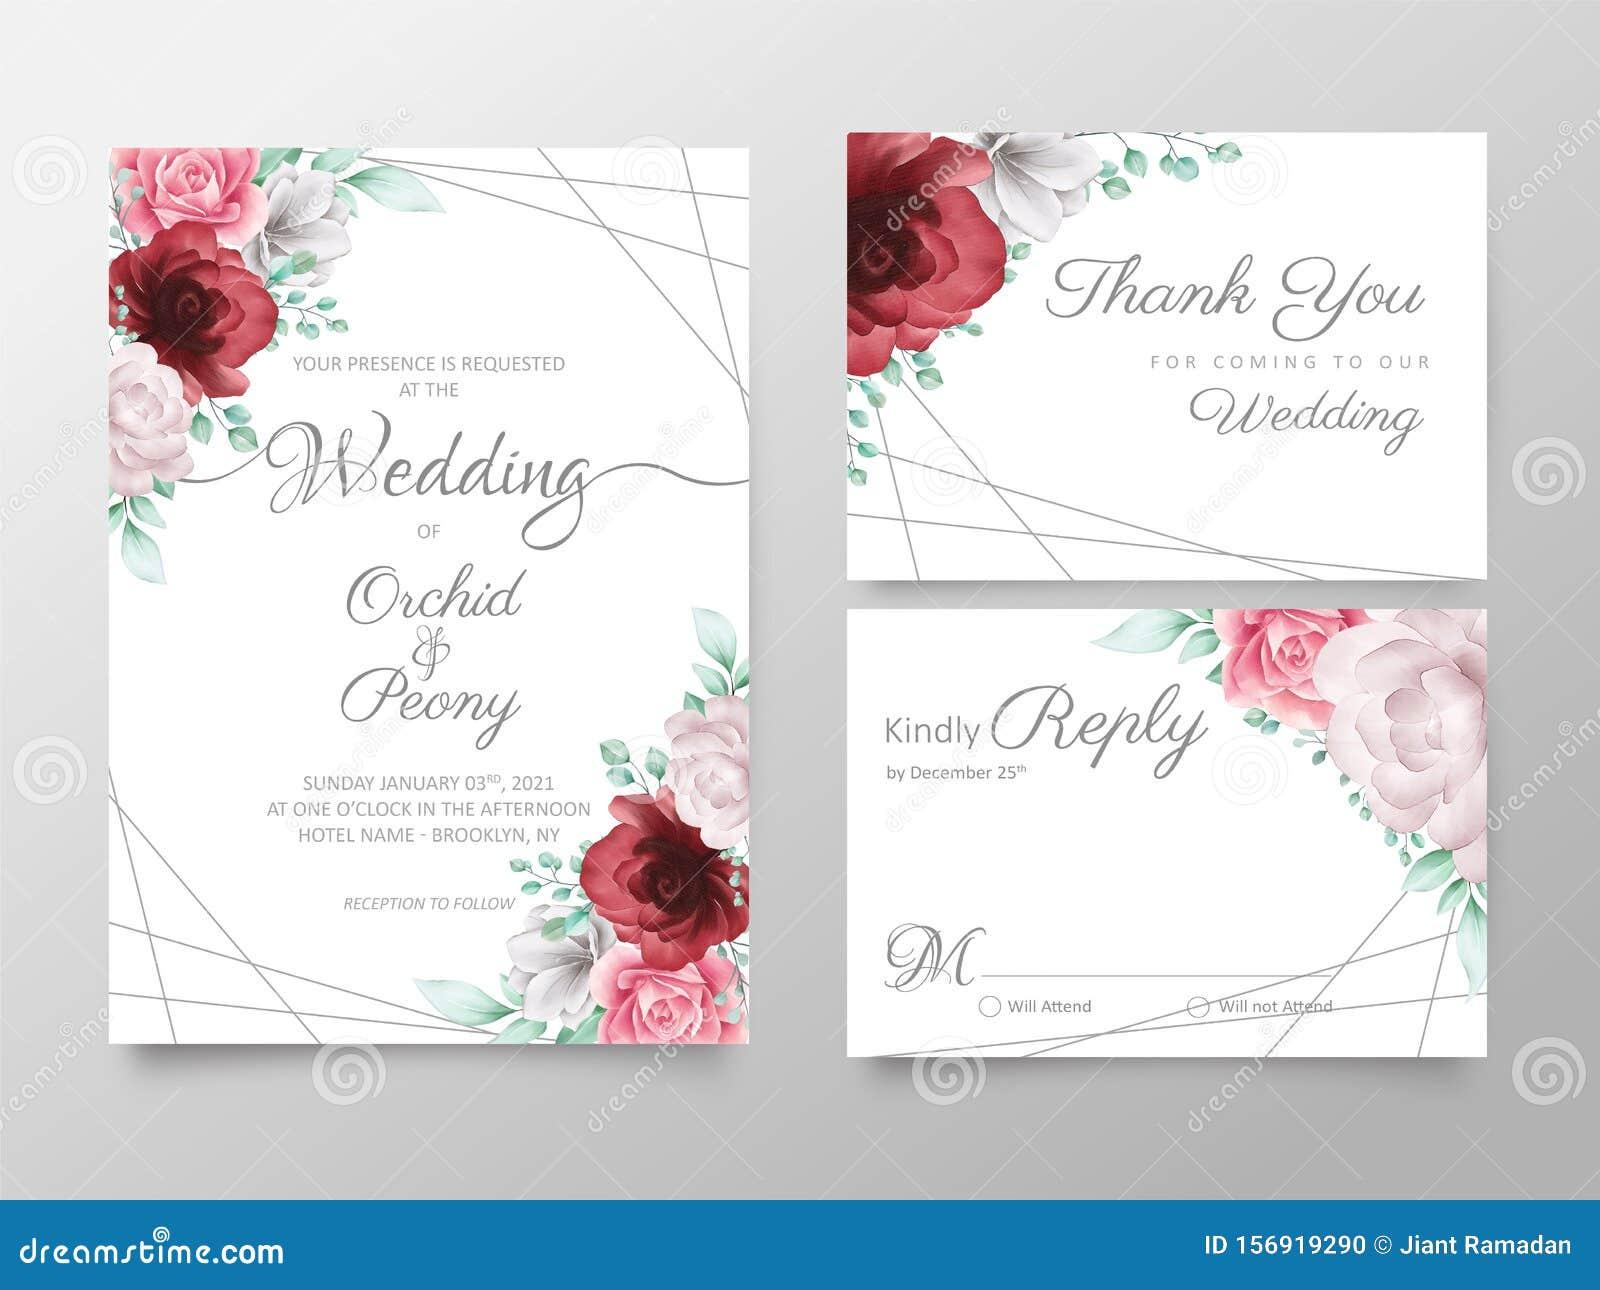 elegant floral wedding invitation cards template set with